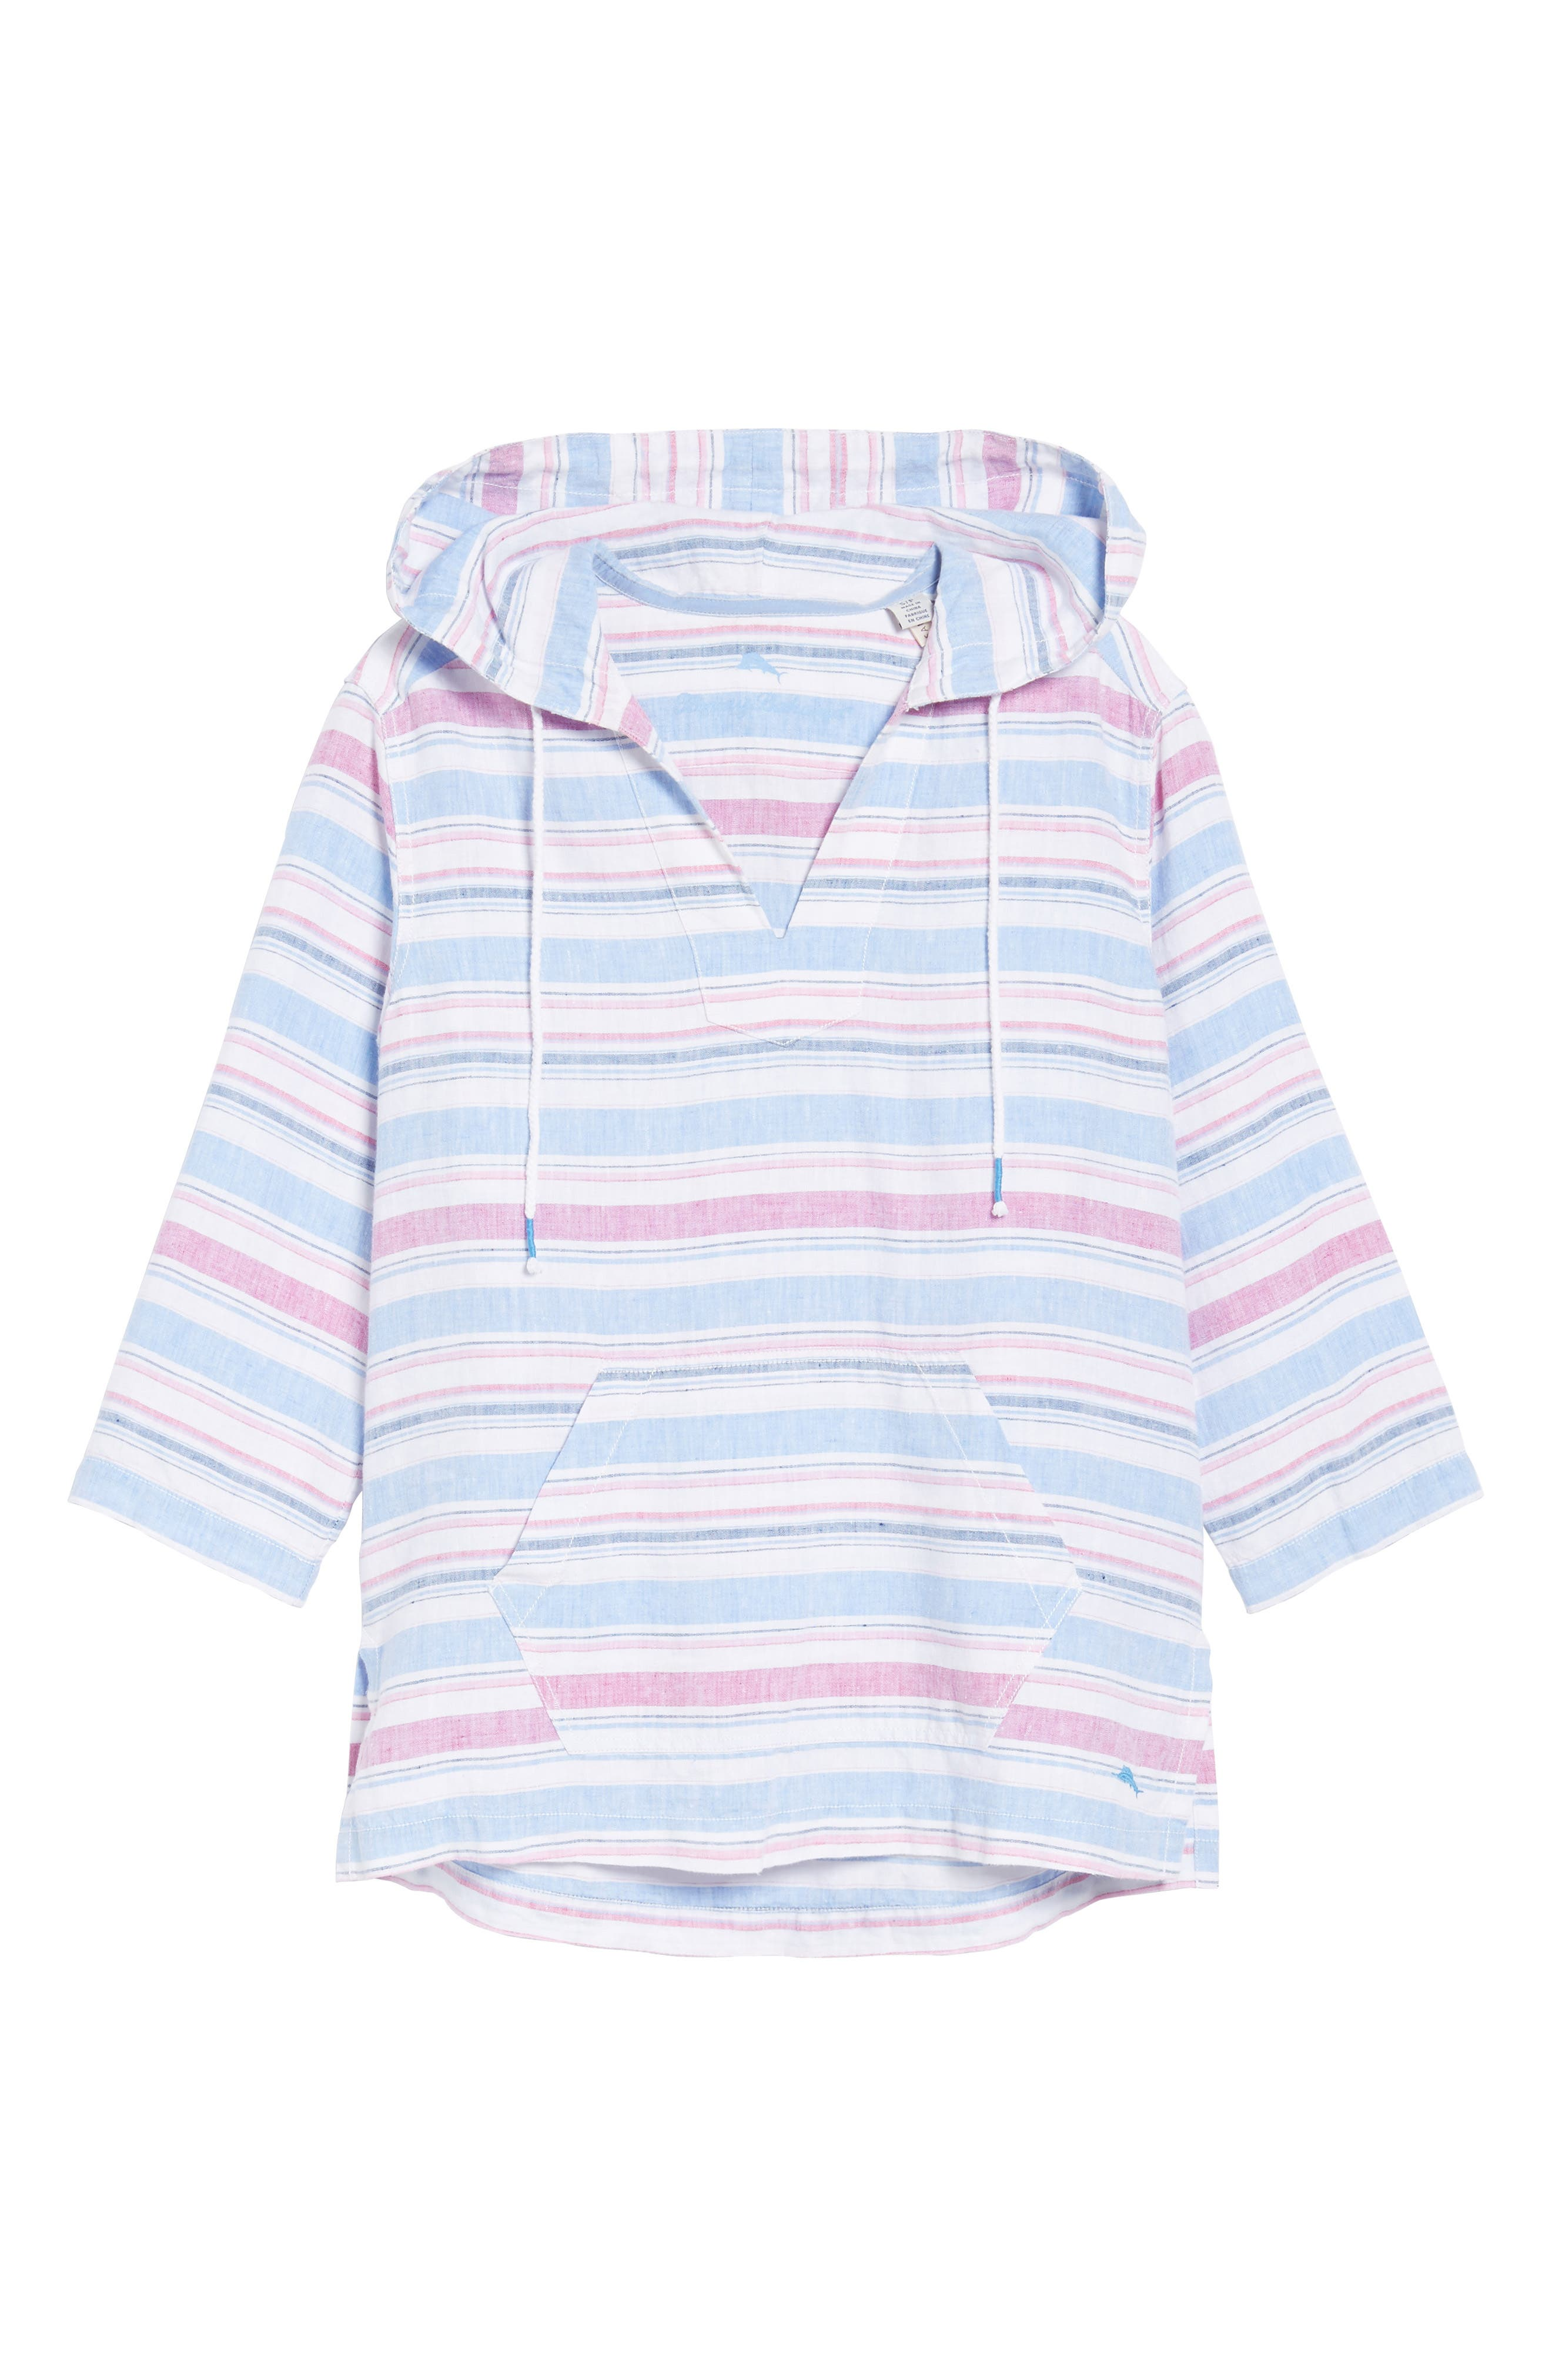 Tulum Stripe Linen Hoodie,                             Alternate thumbnail 6, color,                             MOUNTAIN BLUEBELL